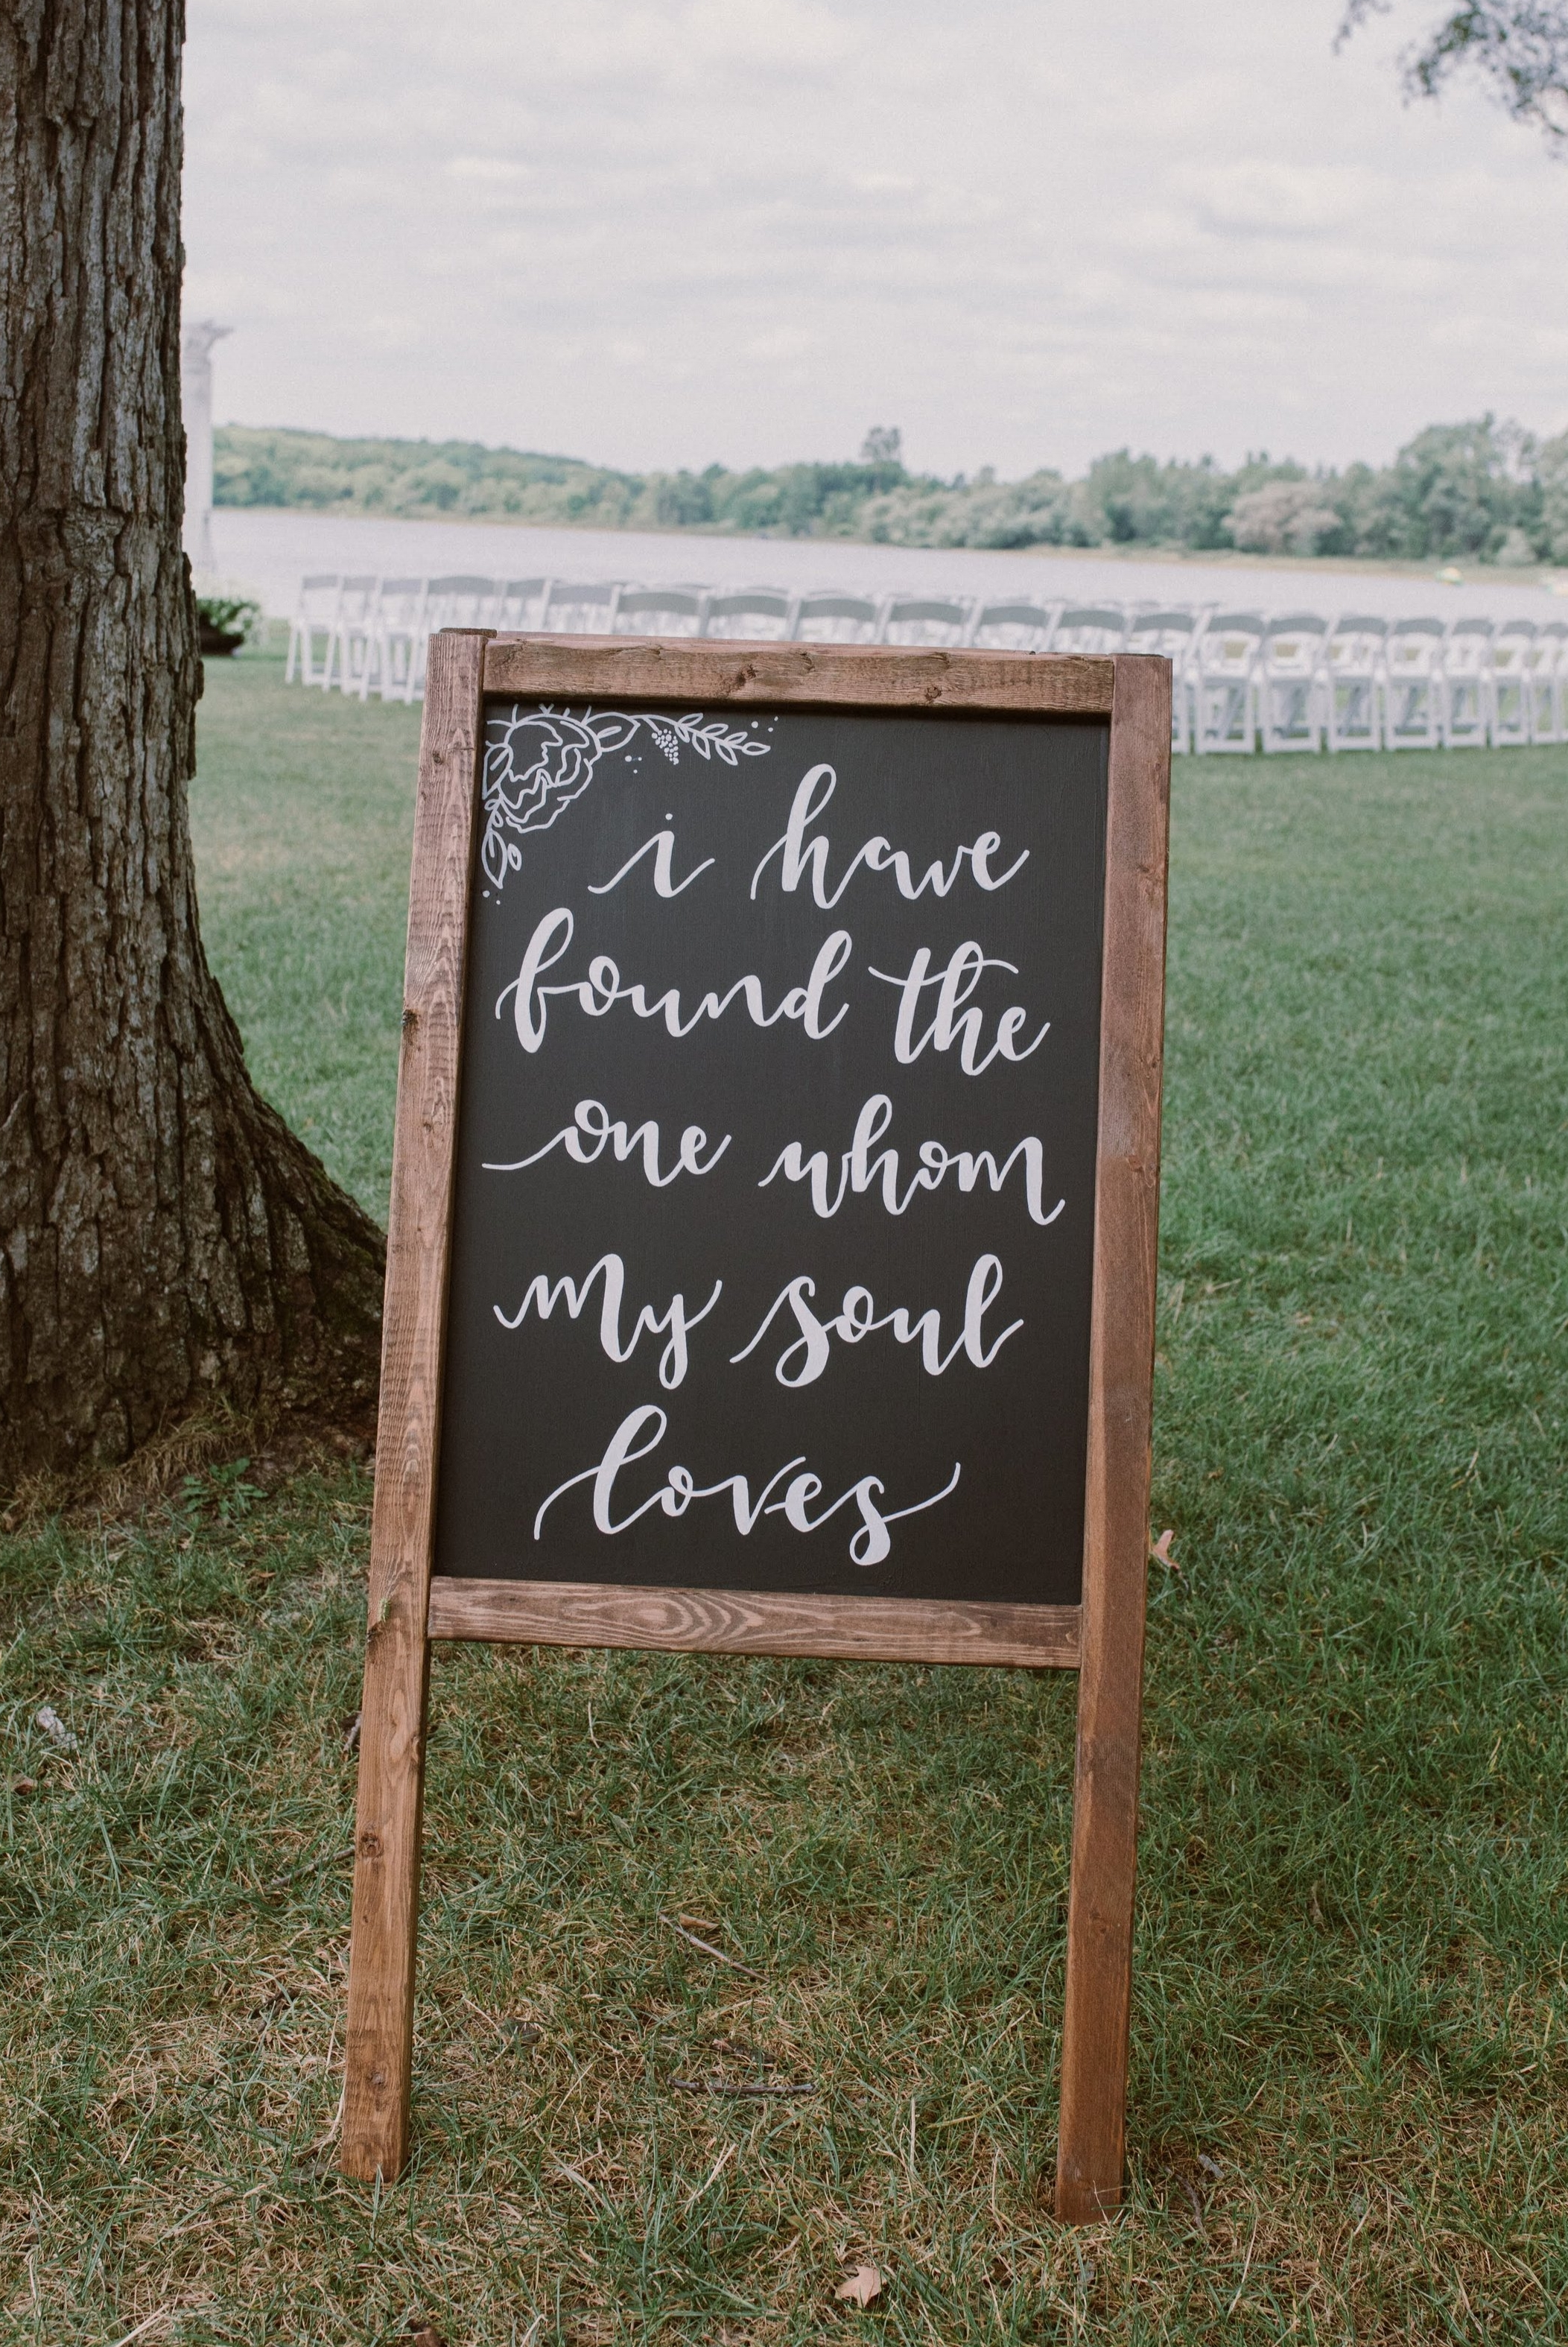 One of Marah and Joel's favorites verses, created by Marah.